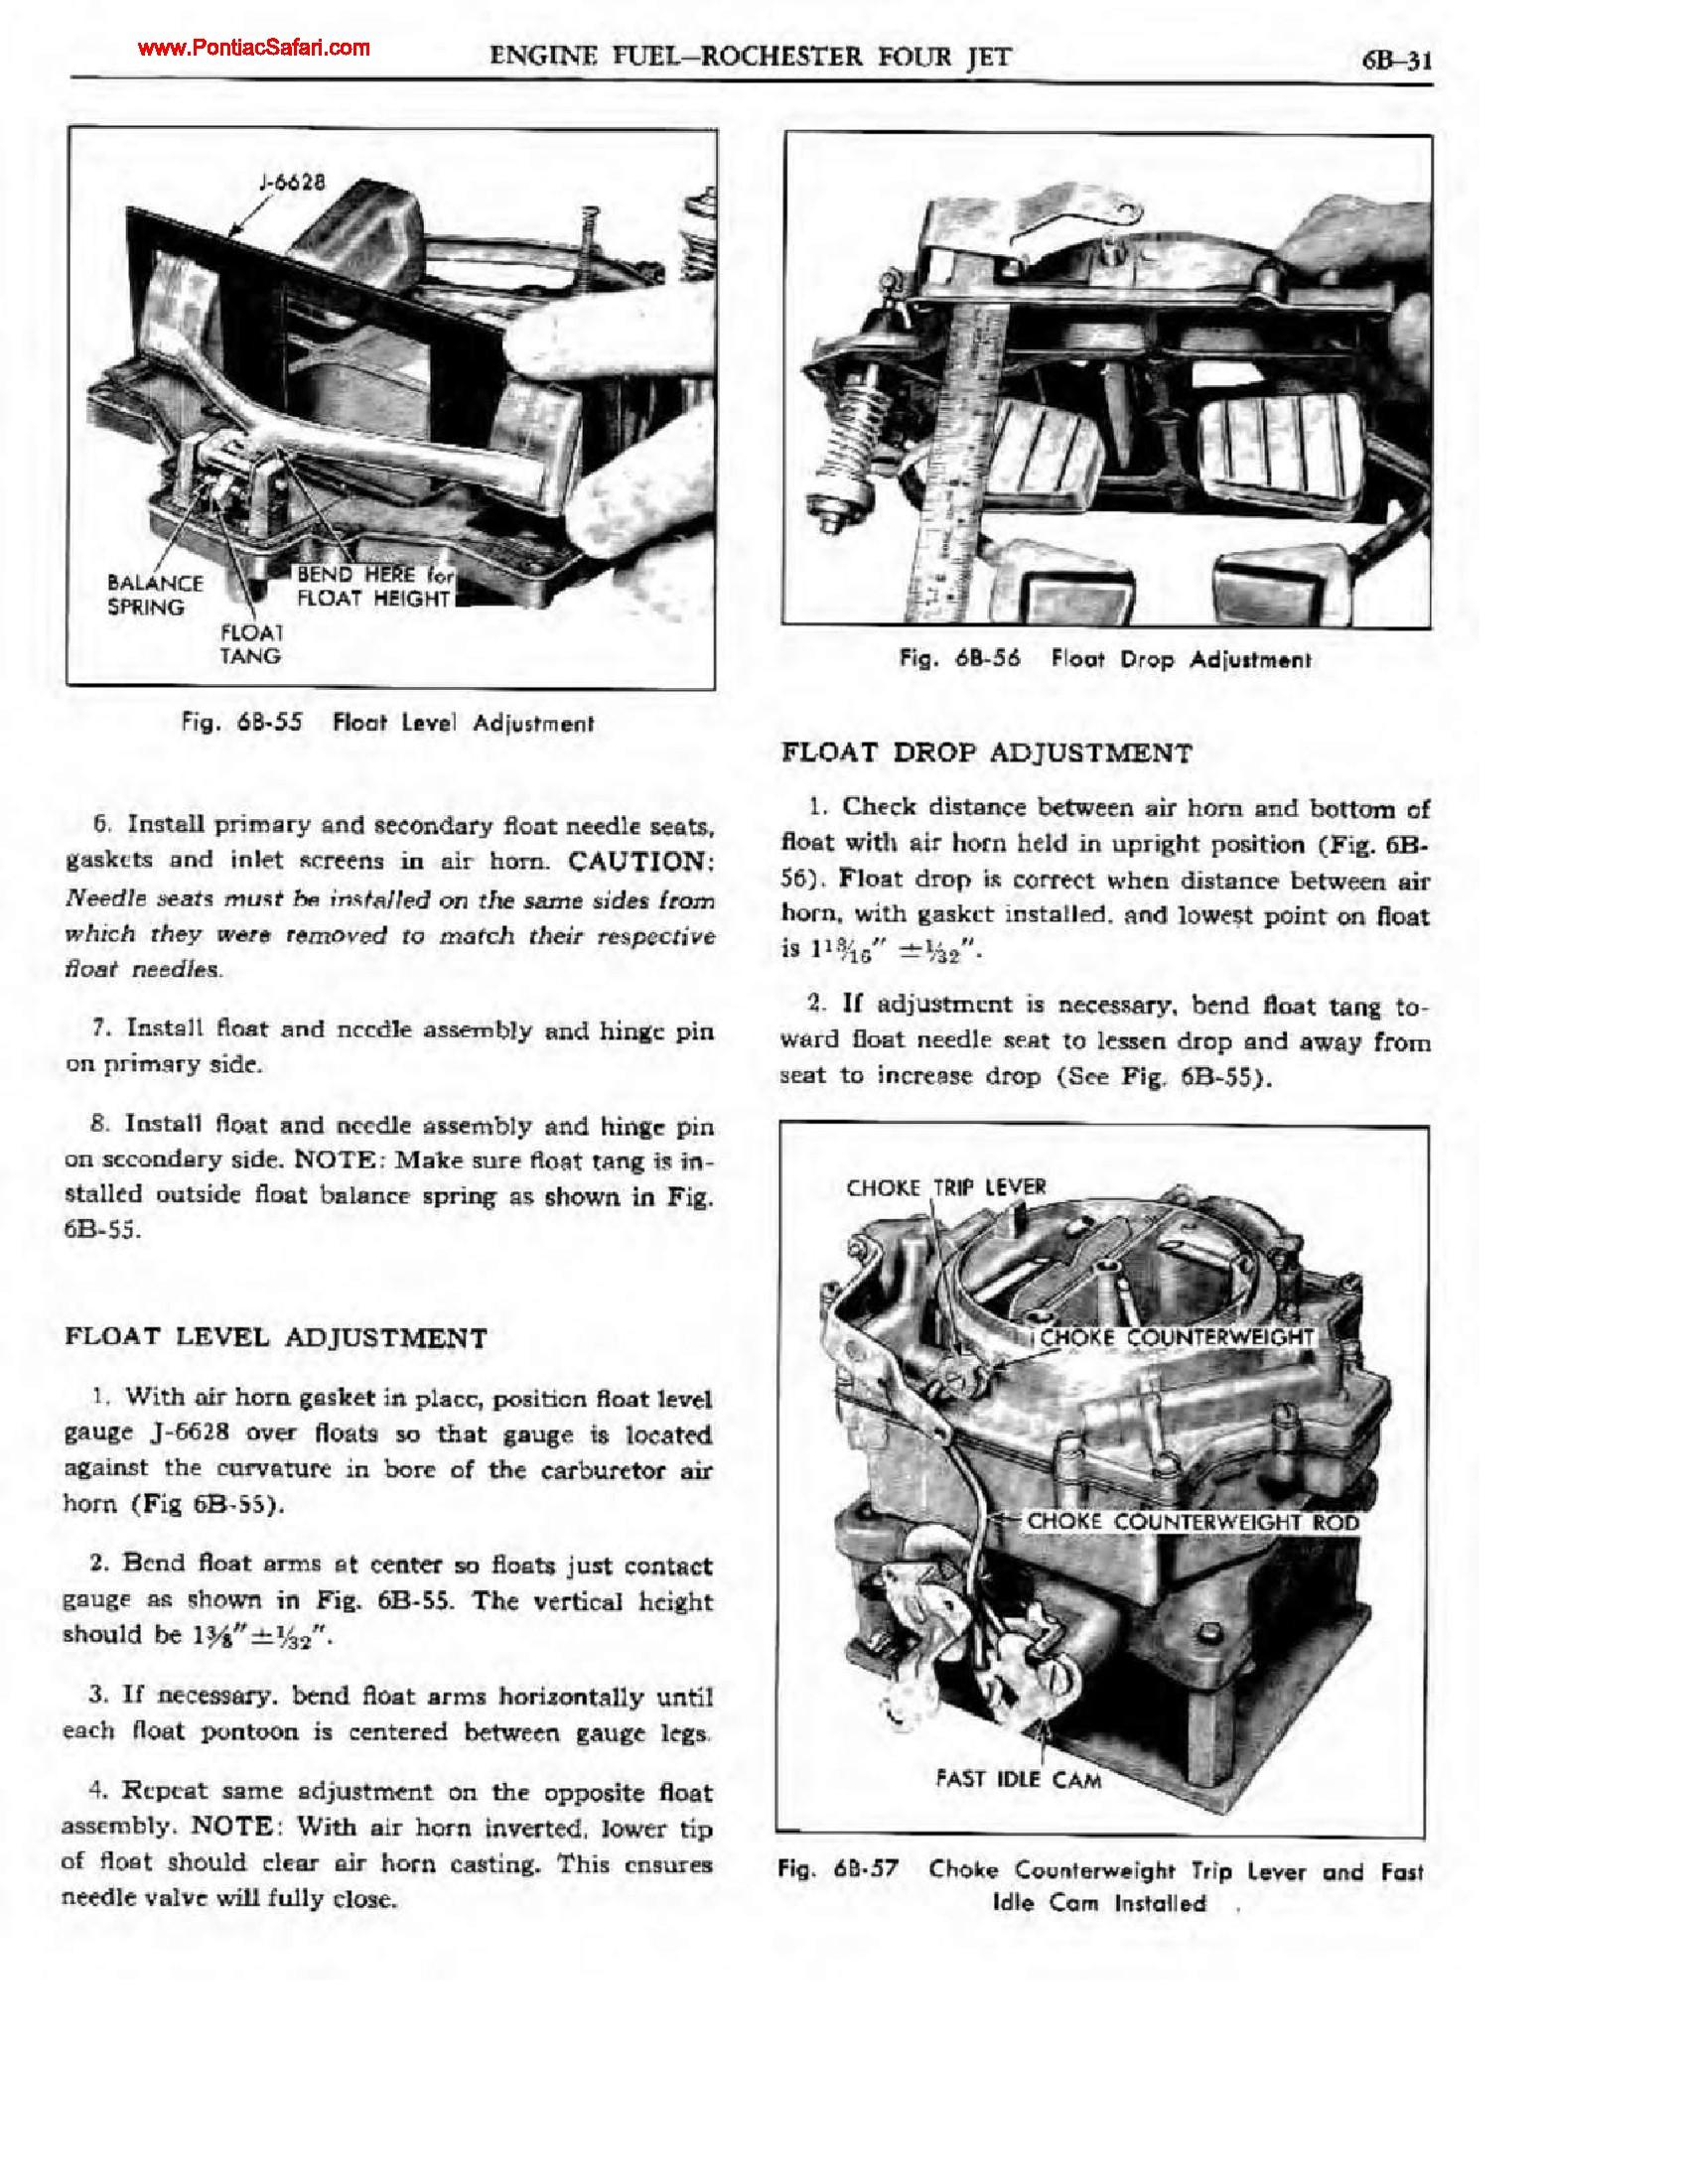 Pontiac Shop Manual